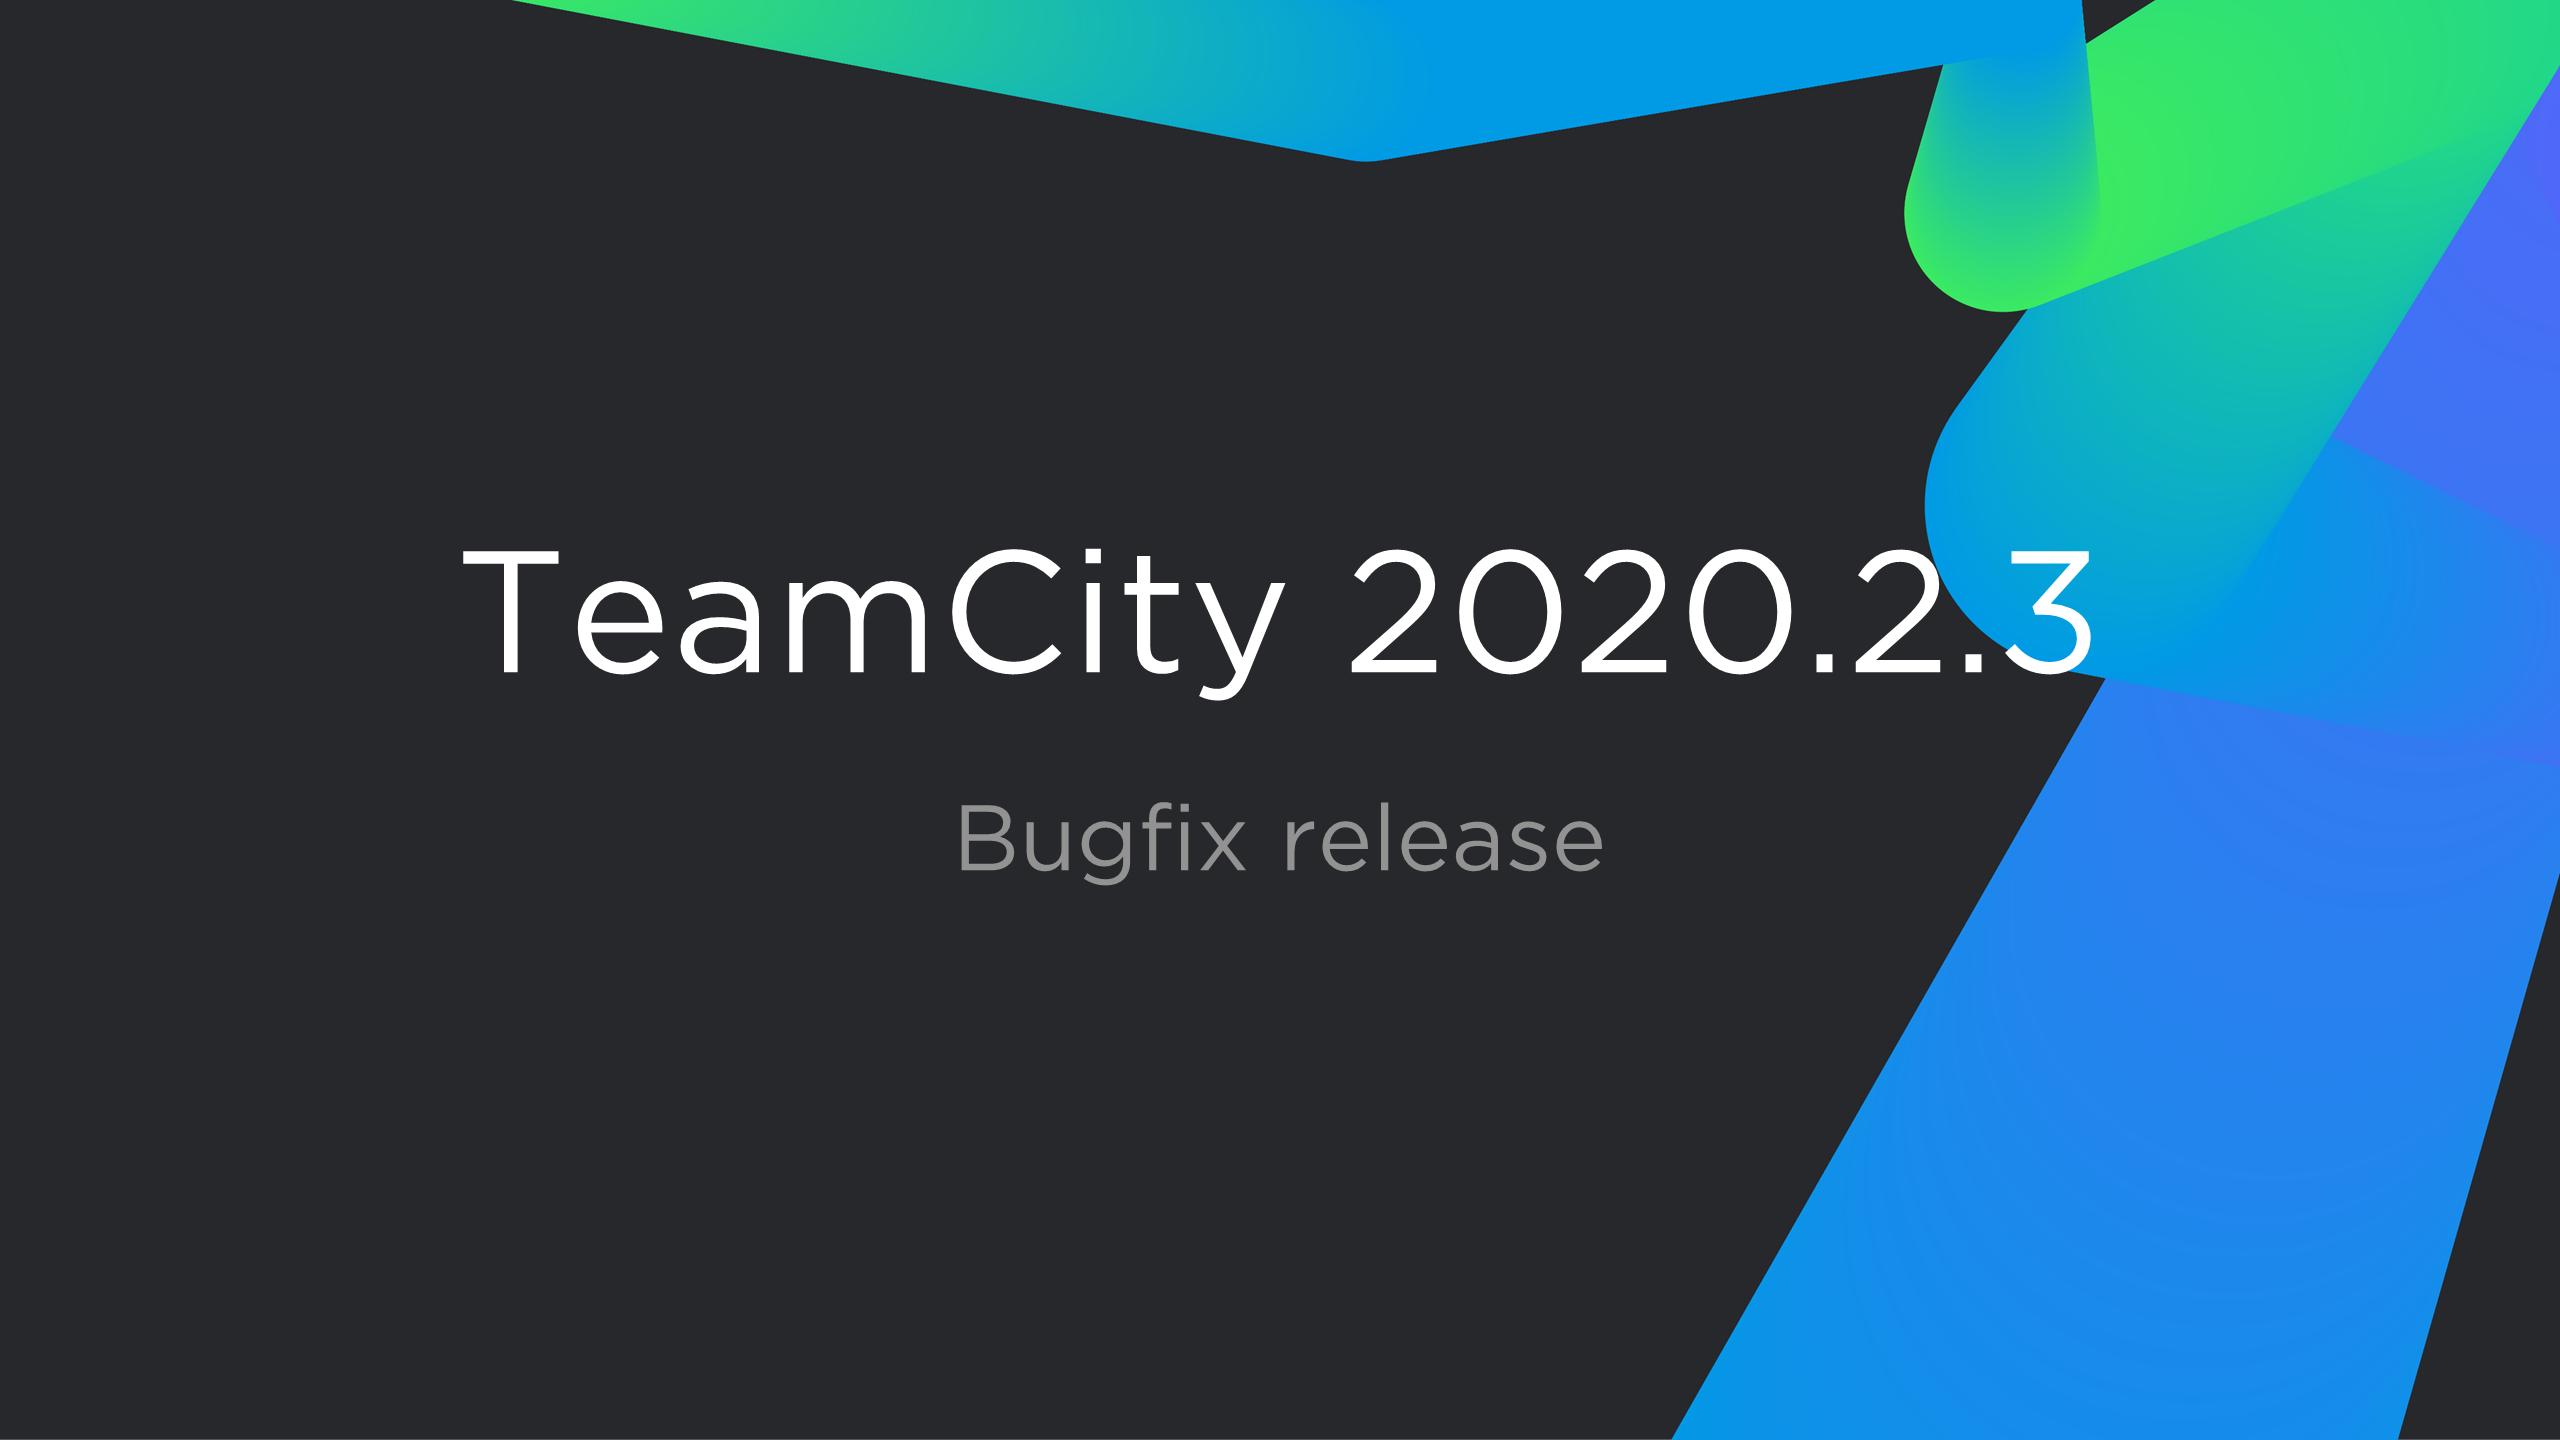 TeamCity 2020.2.3